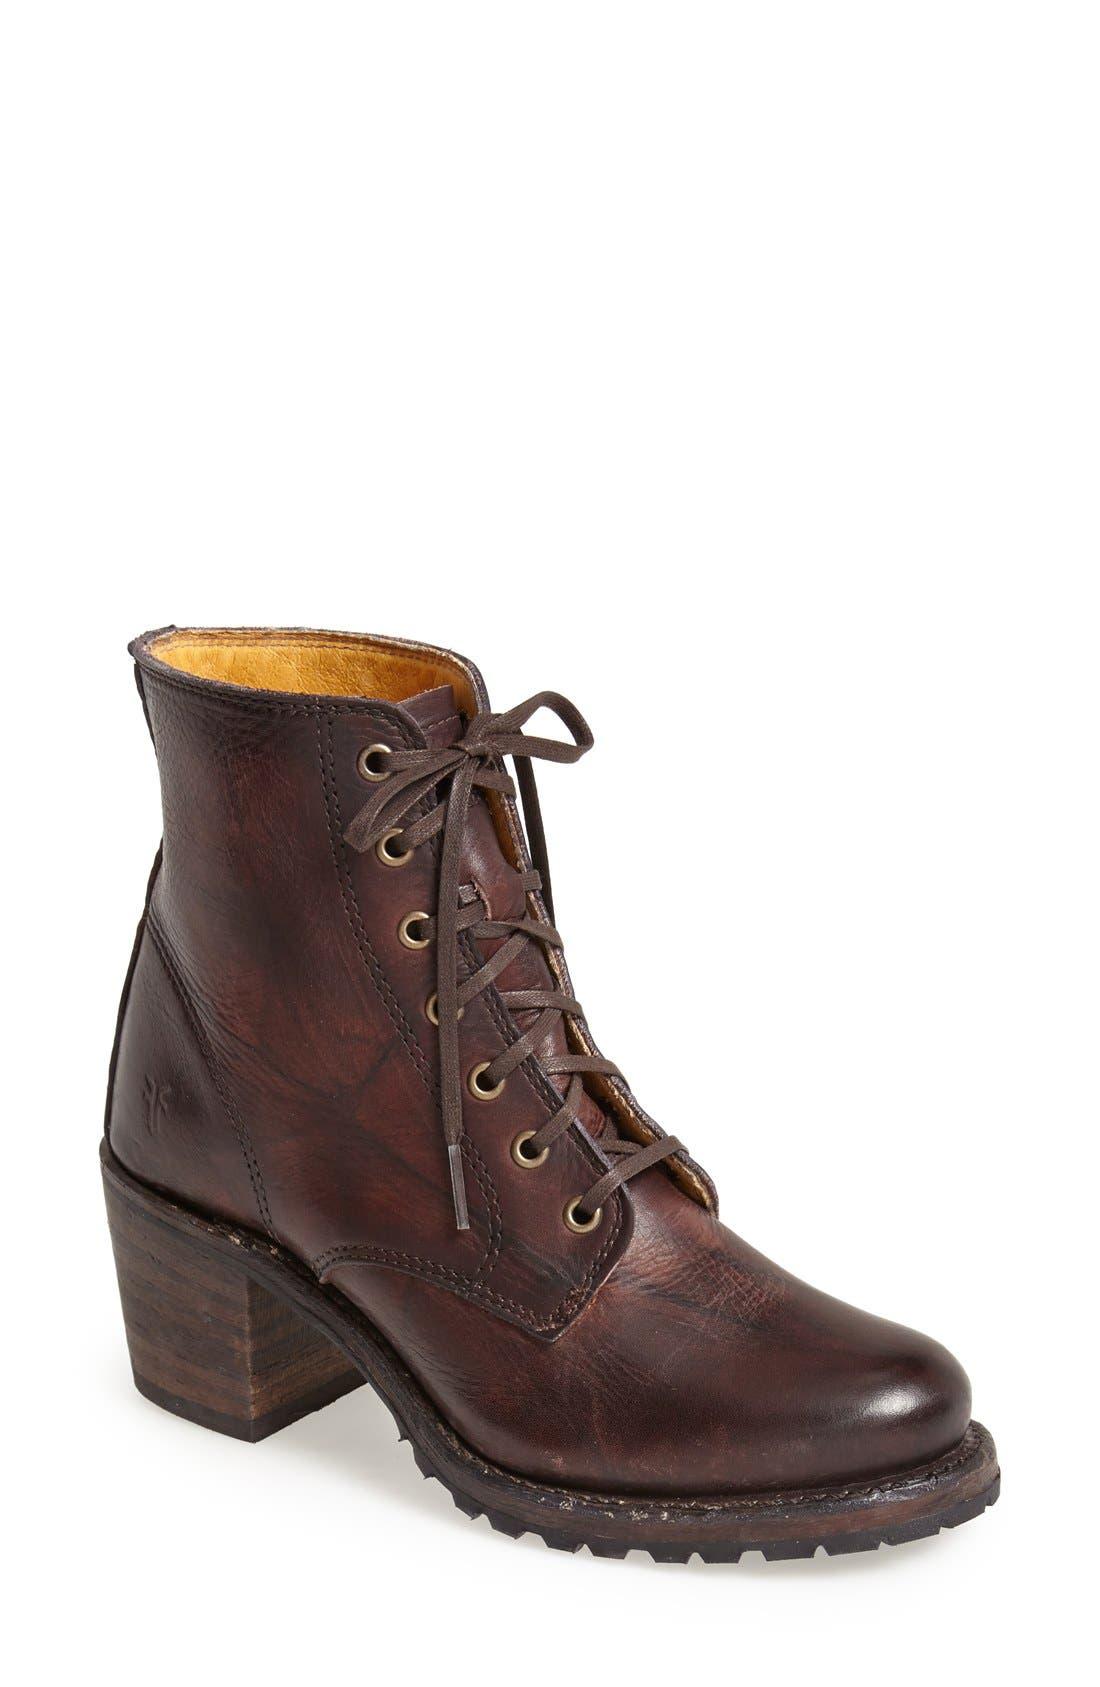 Alternate Image 1 Selected - Frye 'Sabrina' Boot